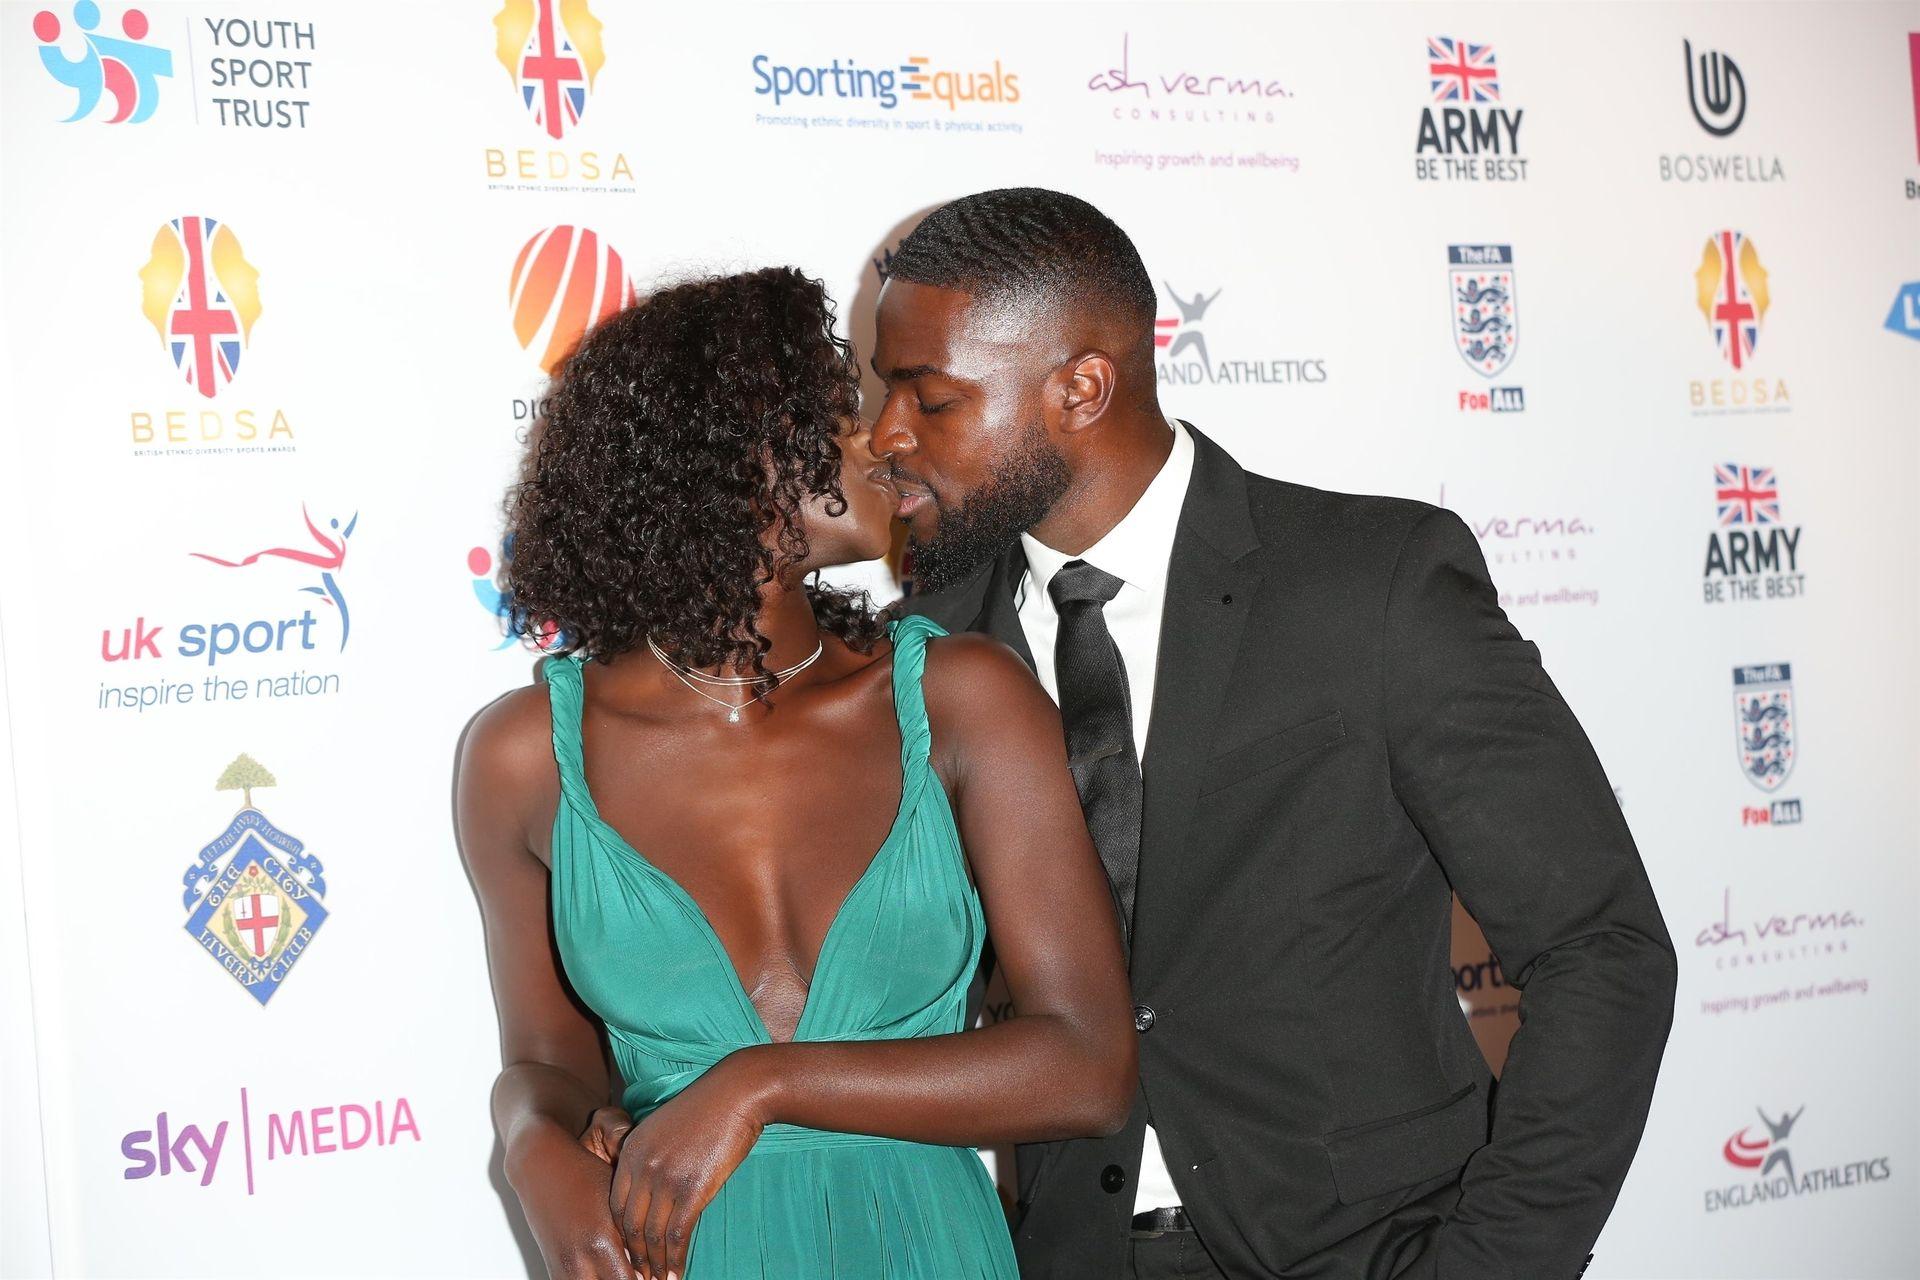 Mike Boateng & Priscilla Anyabu Are Seen At British Ethnic Diversity Sports Awards 0061